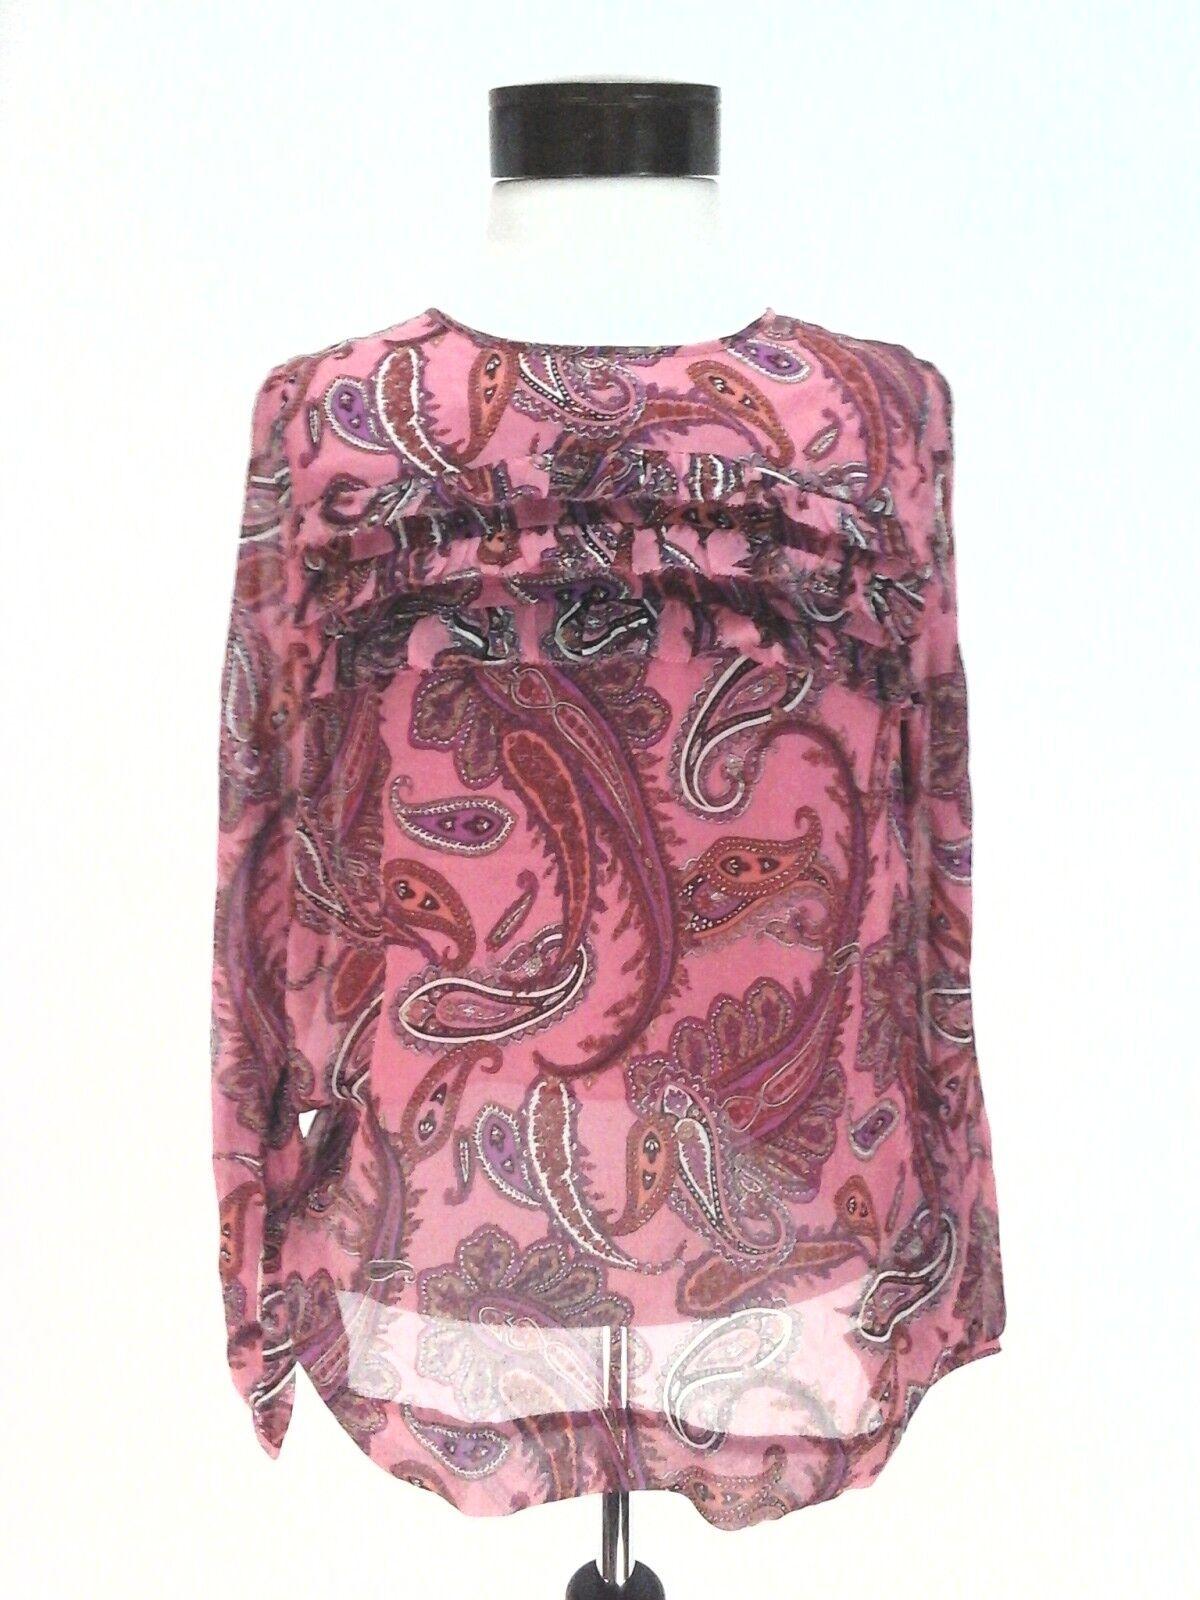 JCREW Silk Shirt Ruffle Blouse Top Rosa lila PAISLEY Woherren 2 Fits XS  New